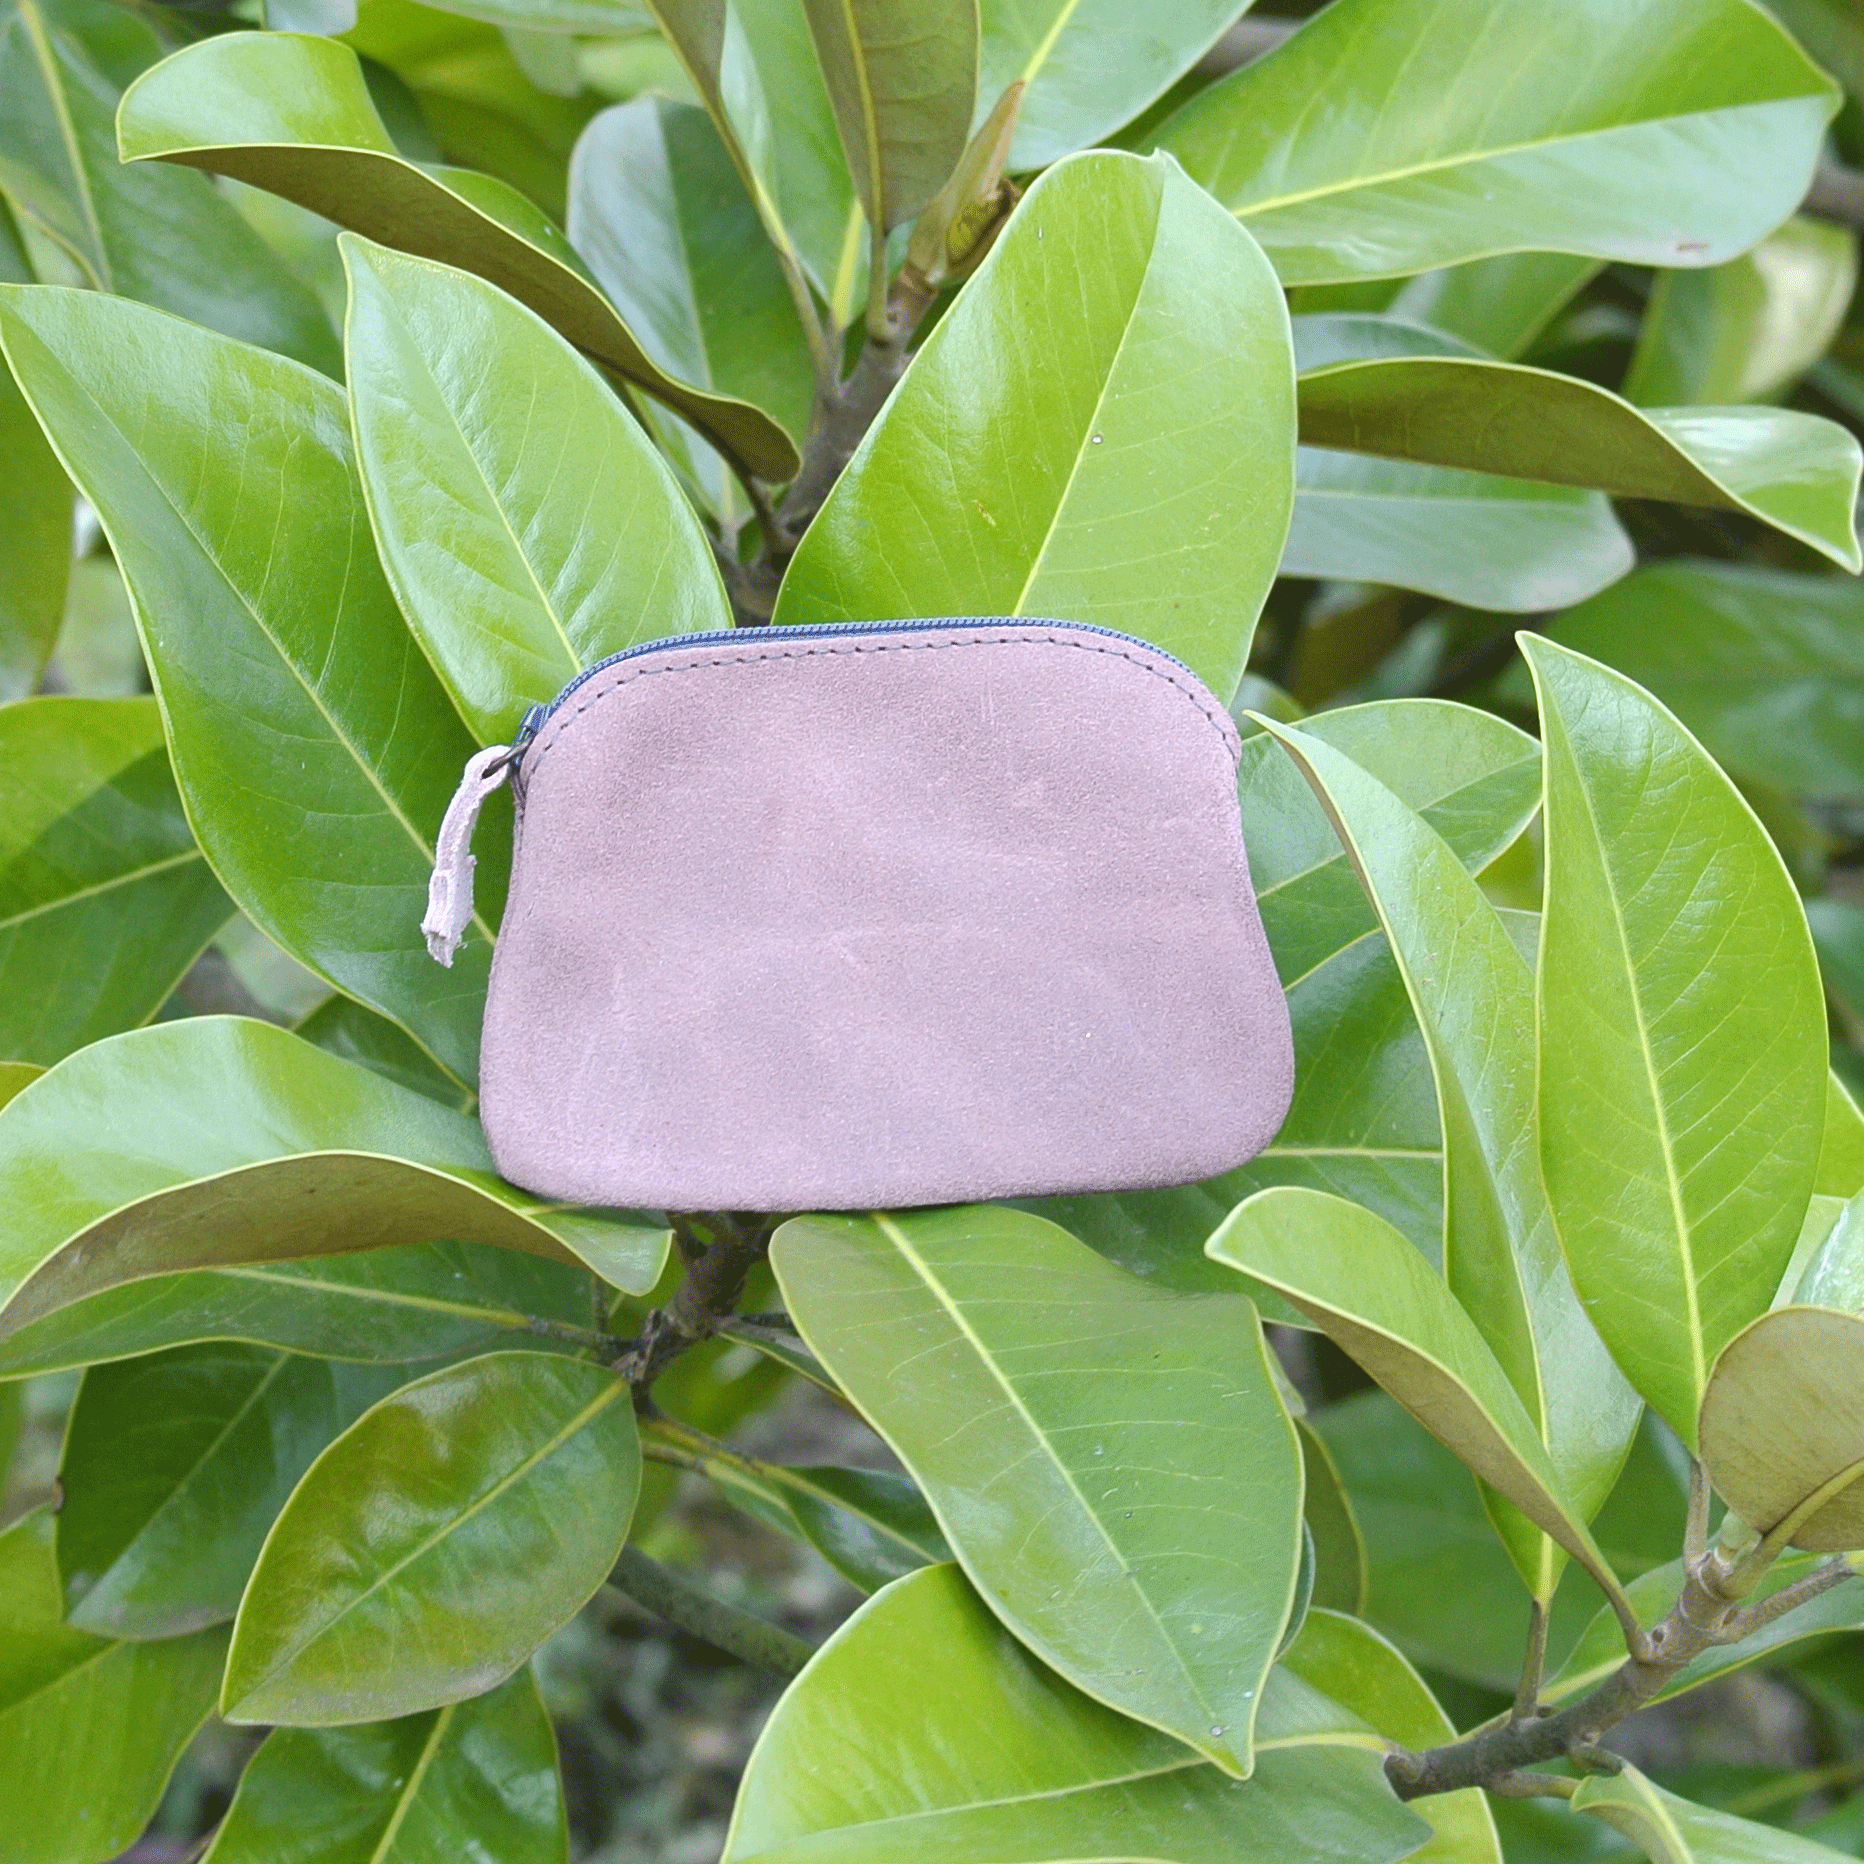 cuirs-fantaisies-la-cartabliere-fabrique-en-france-porte-monnaie-kiwi-en-cuir-retro-rose-ancien